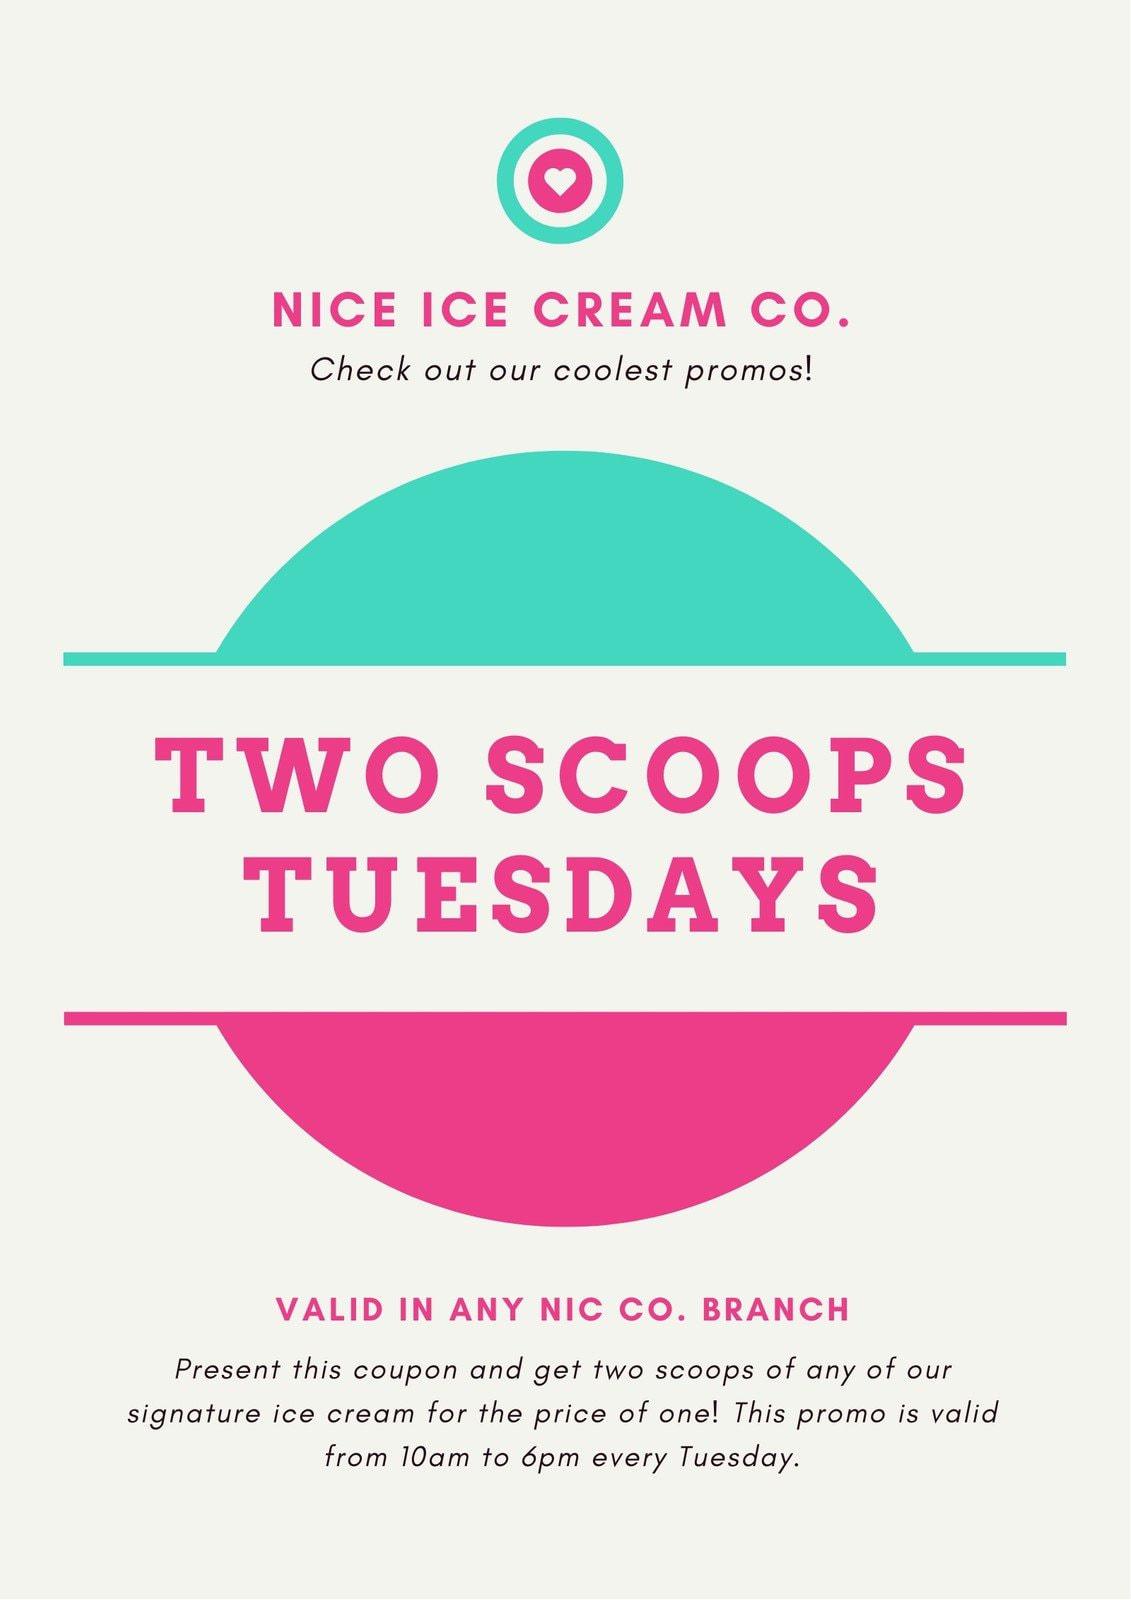 Colorful Modern Basic Shapes Ice Cream Coupon